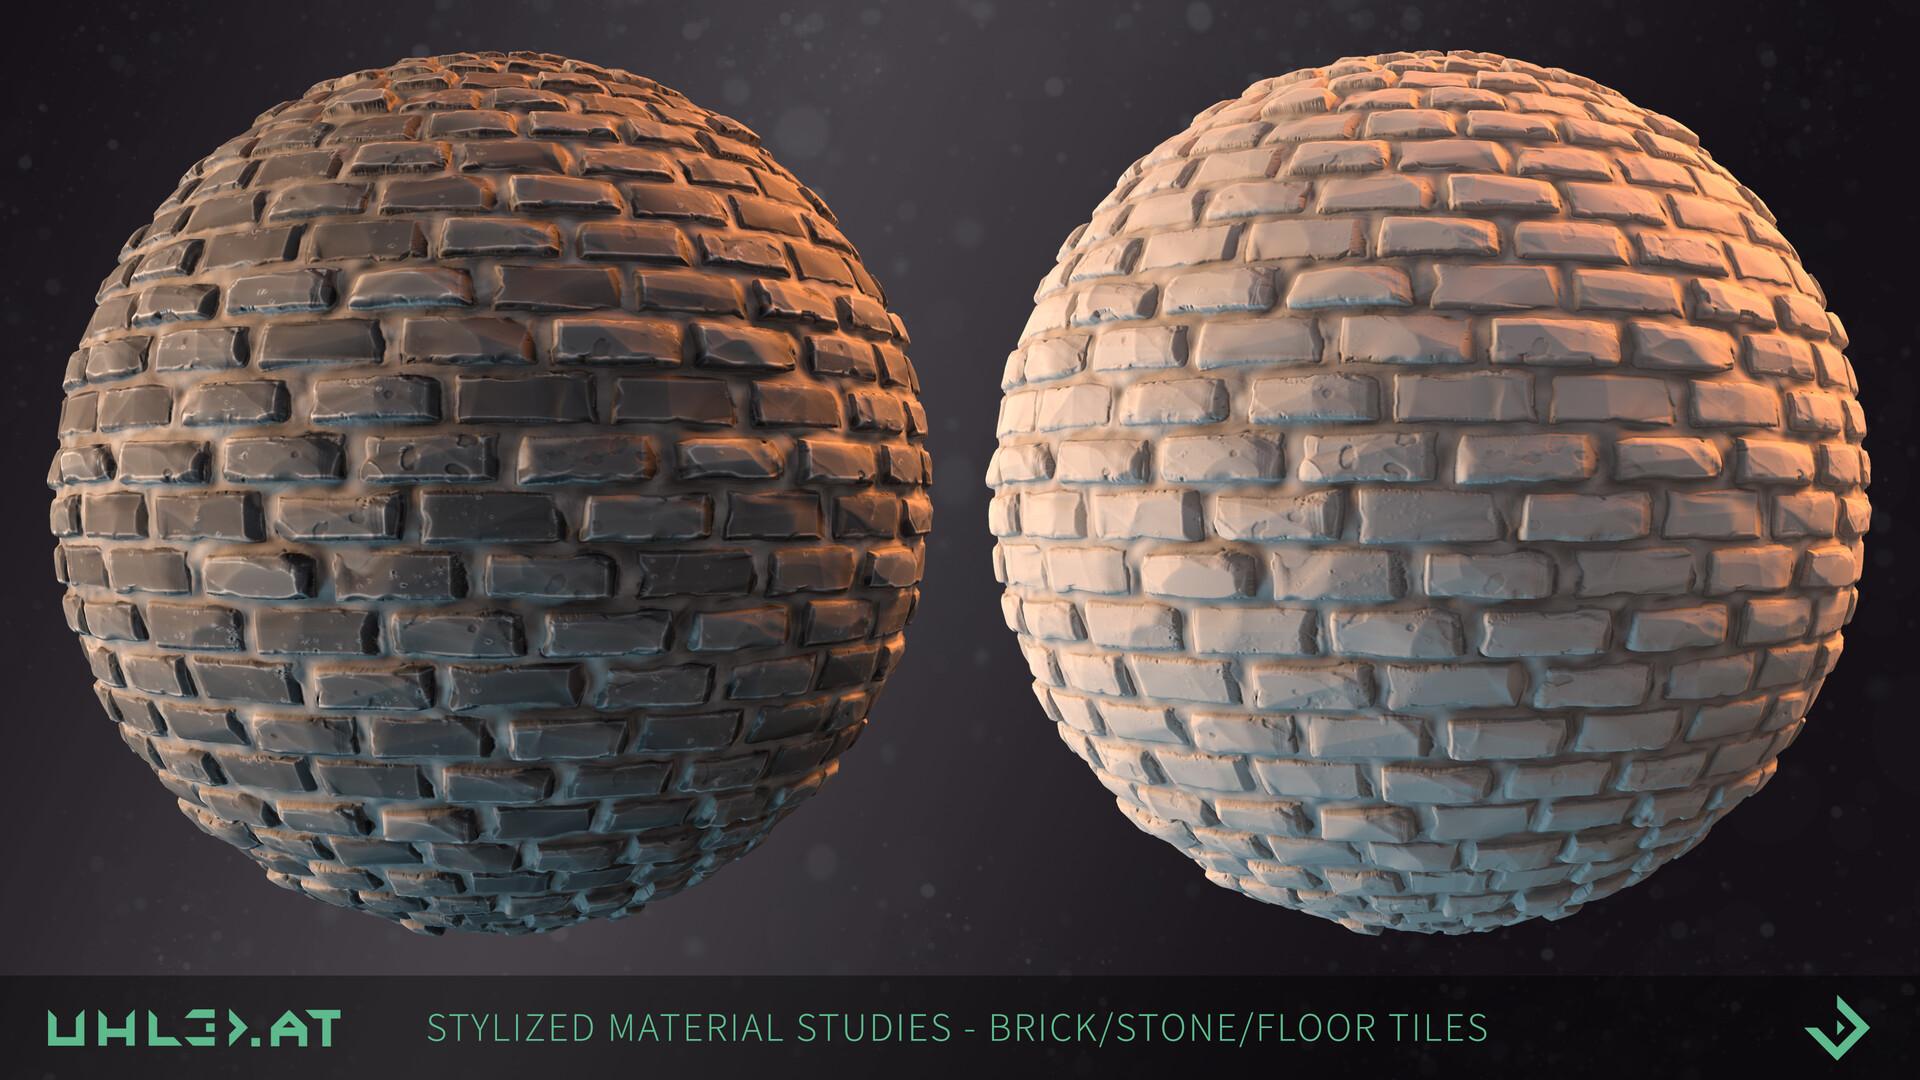 Dominik uhl stylized brick stone studies 05